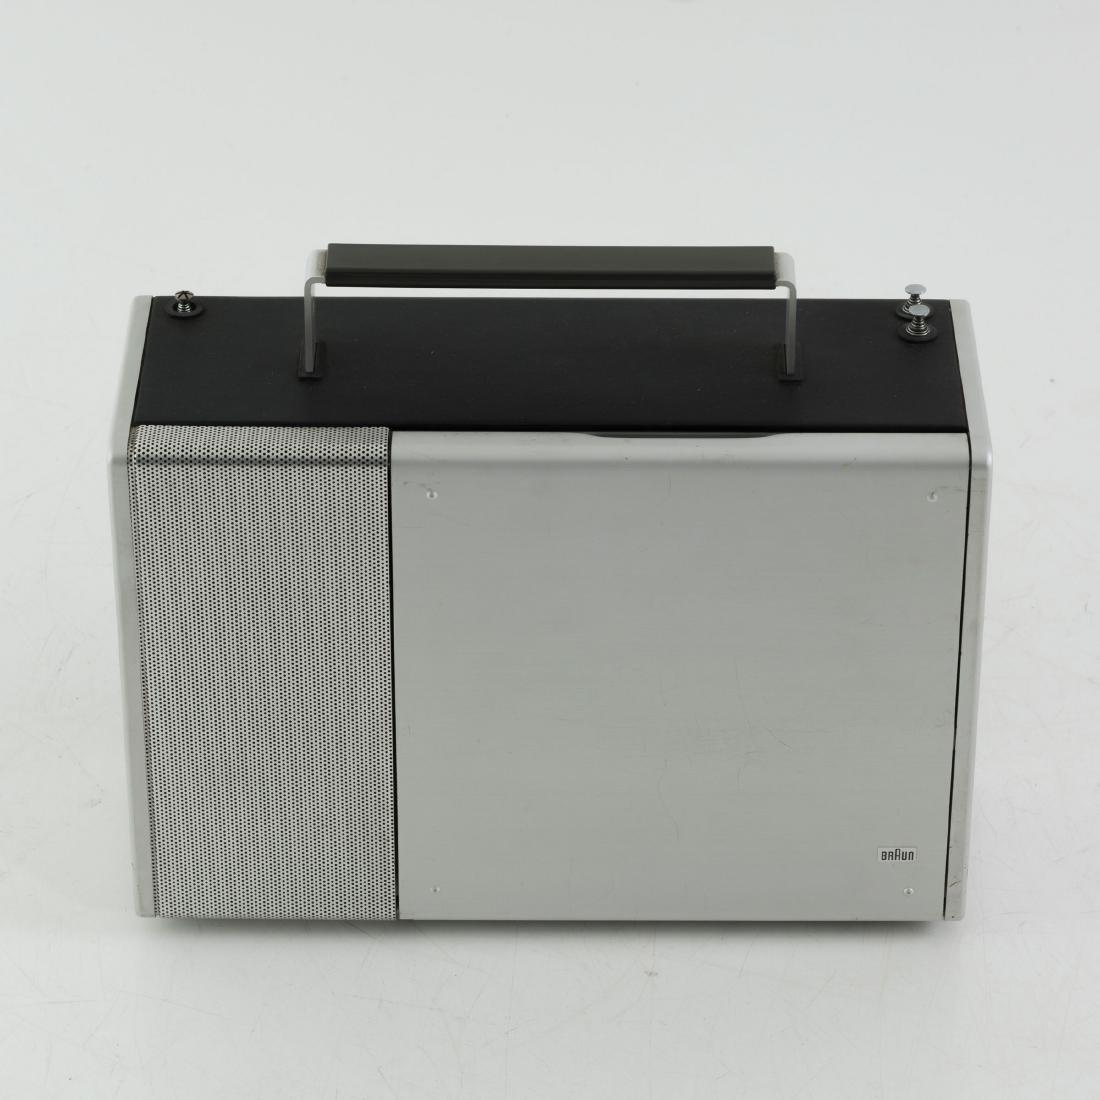 'T-1000'  radio, 1963 - 7